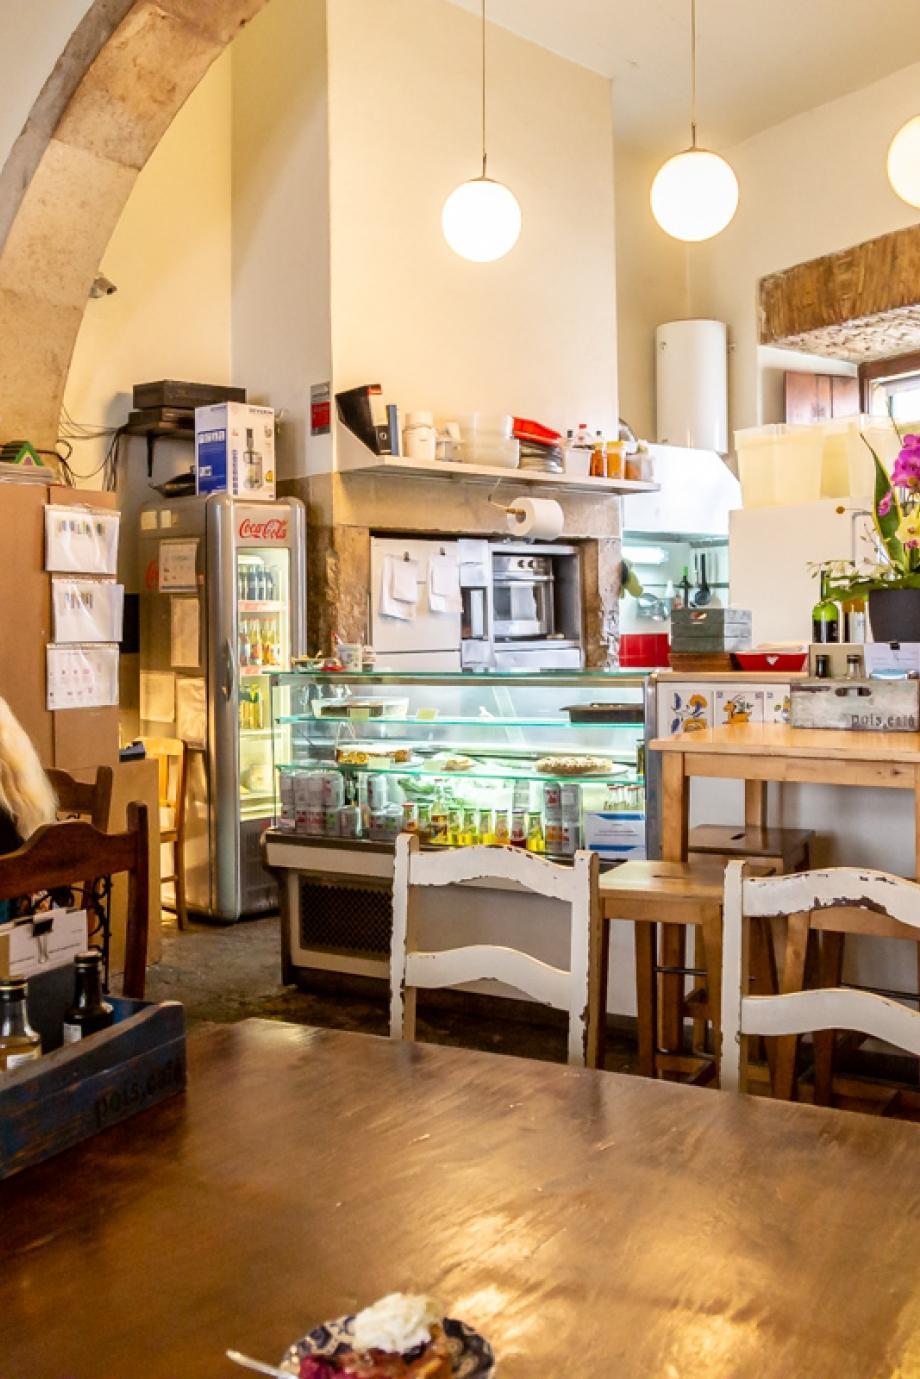 LisboaCool_Comer_Pois,café